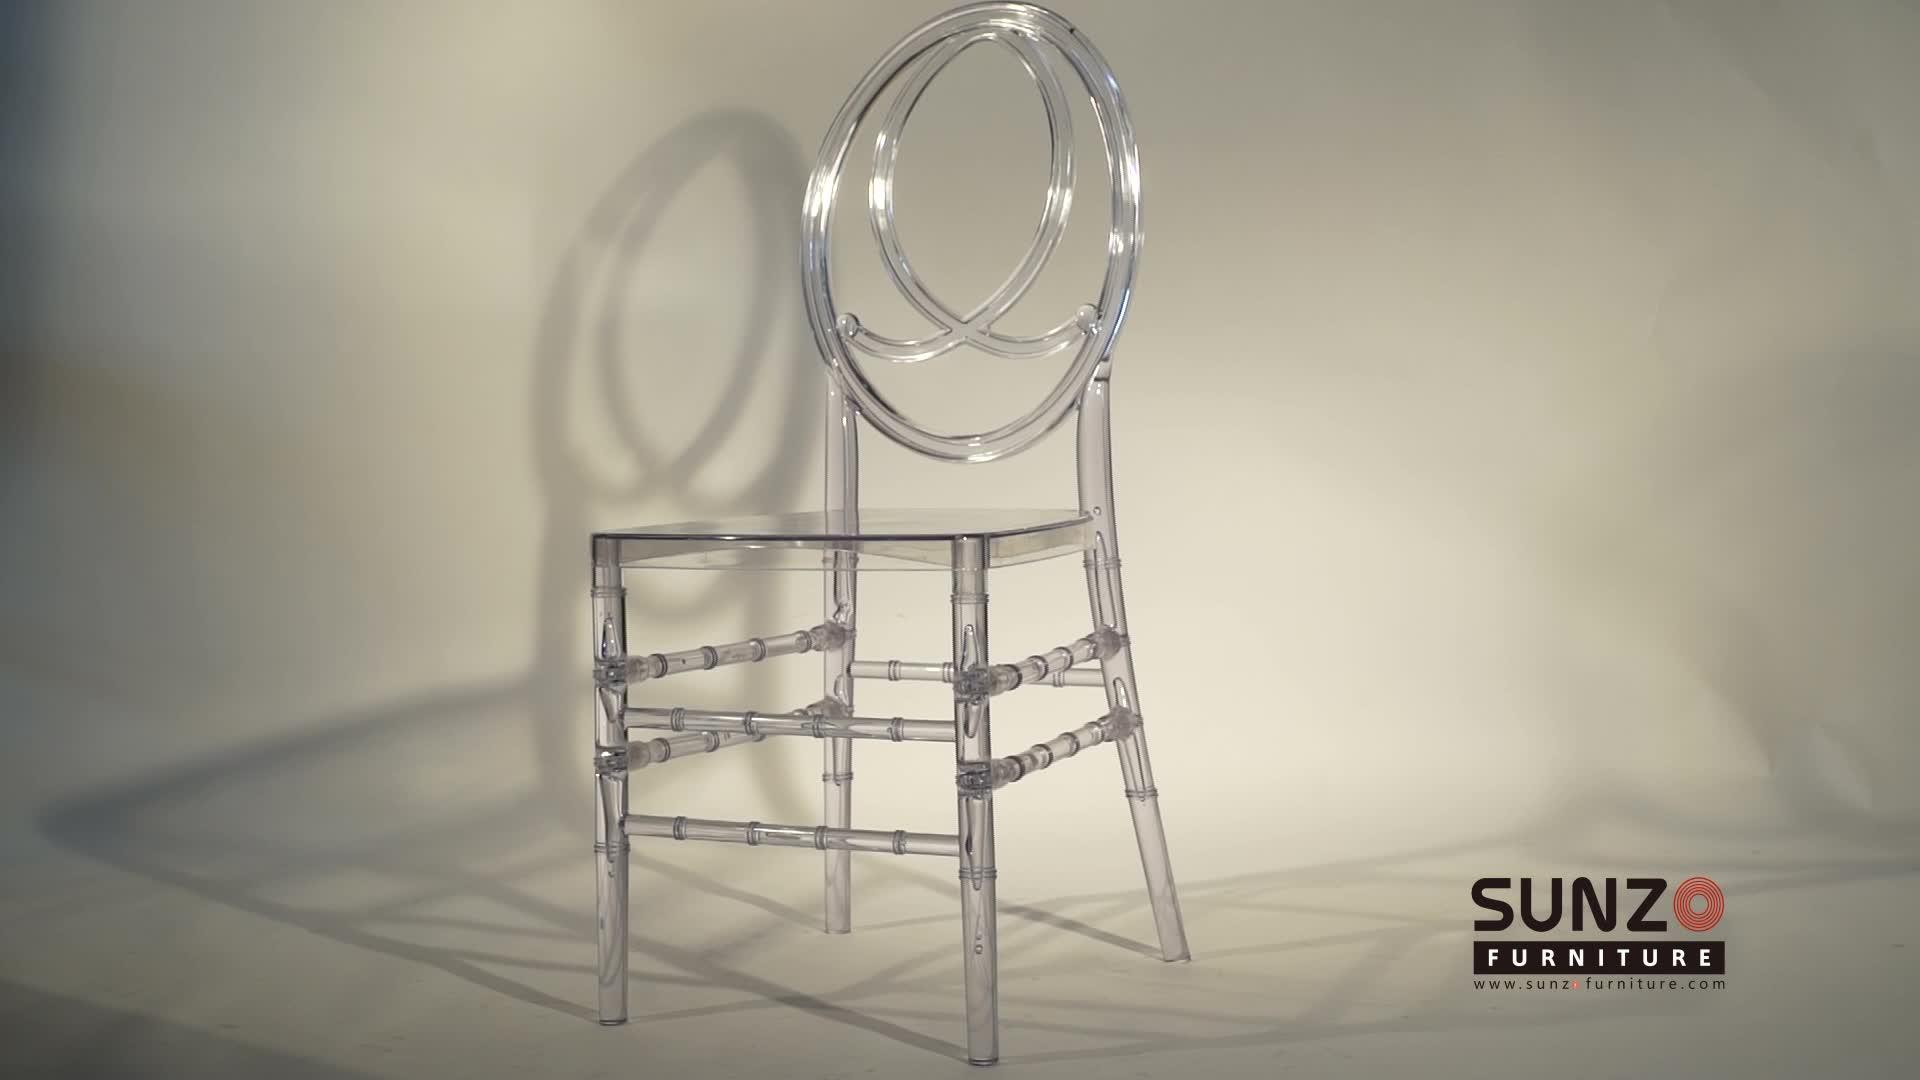 wedding chair alibaba antique folding rocking styles acrylic chairs cheap phoenix tiffany buy